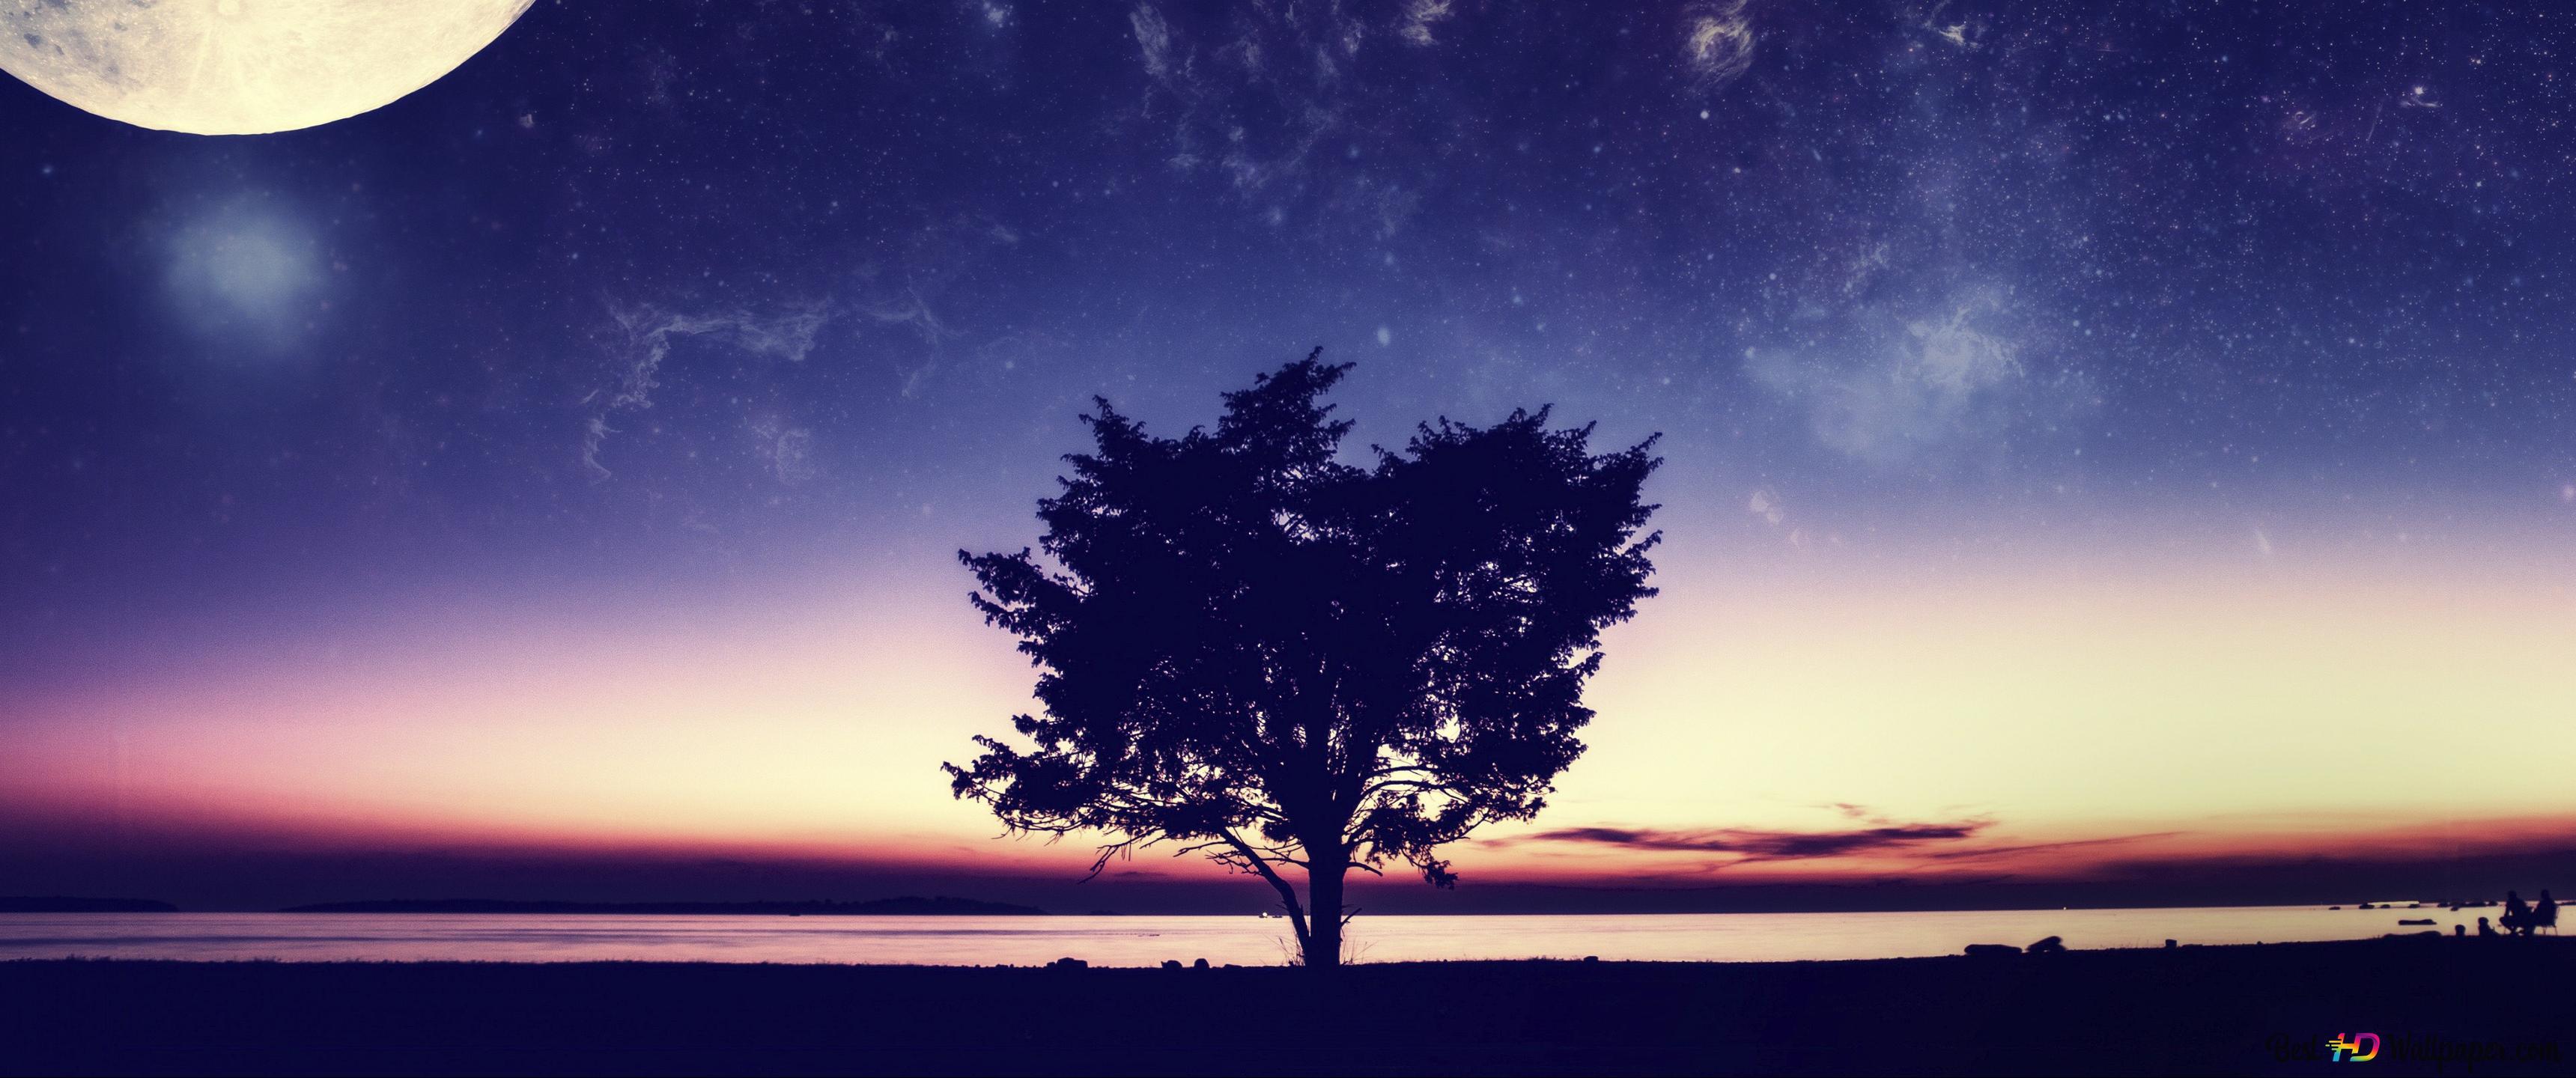 Full Moon Day 4k Download Di Sfondi Hd